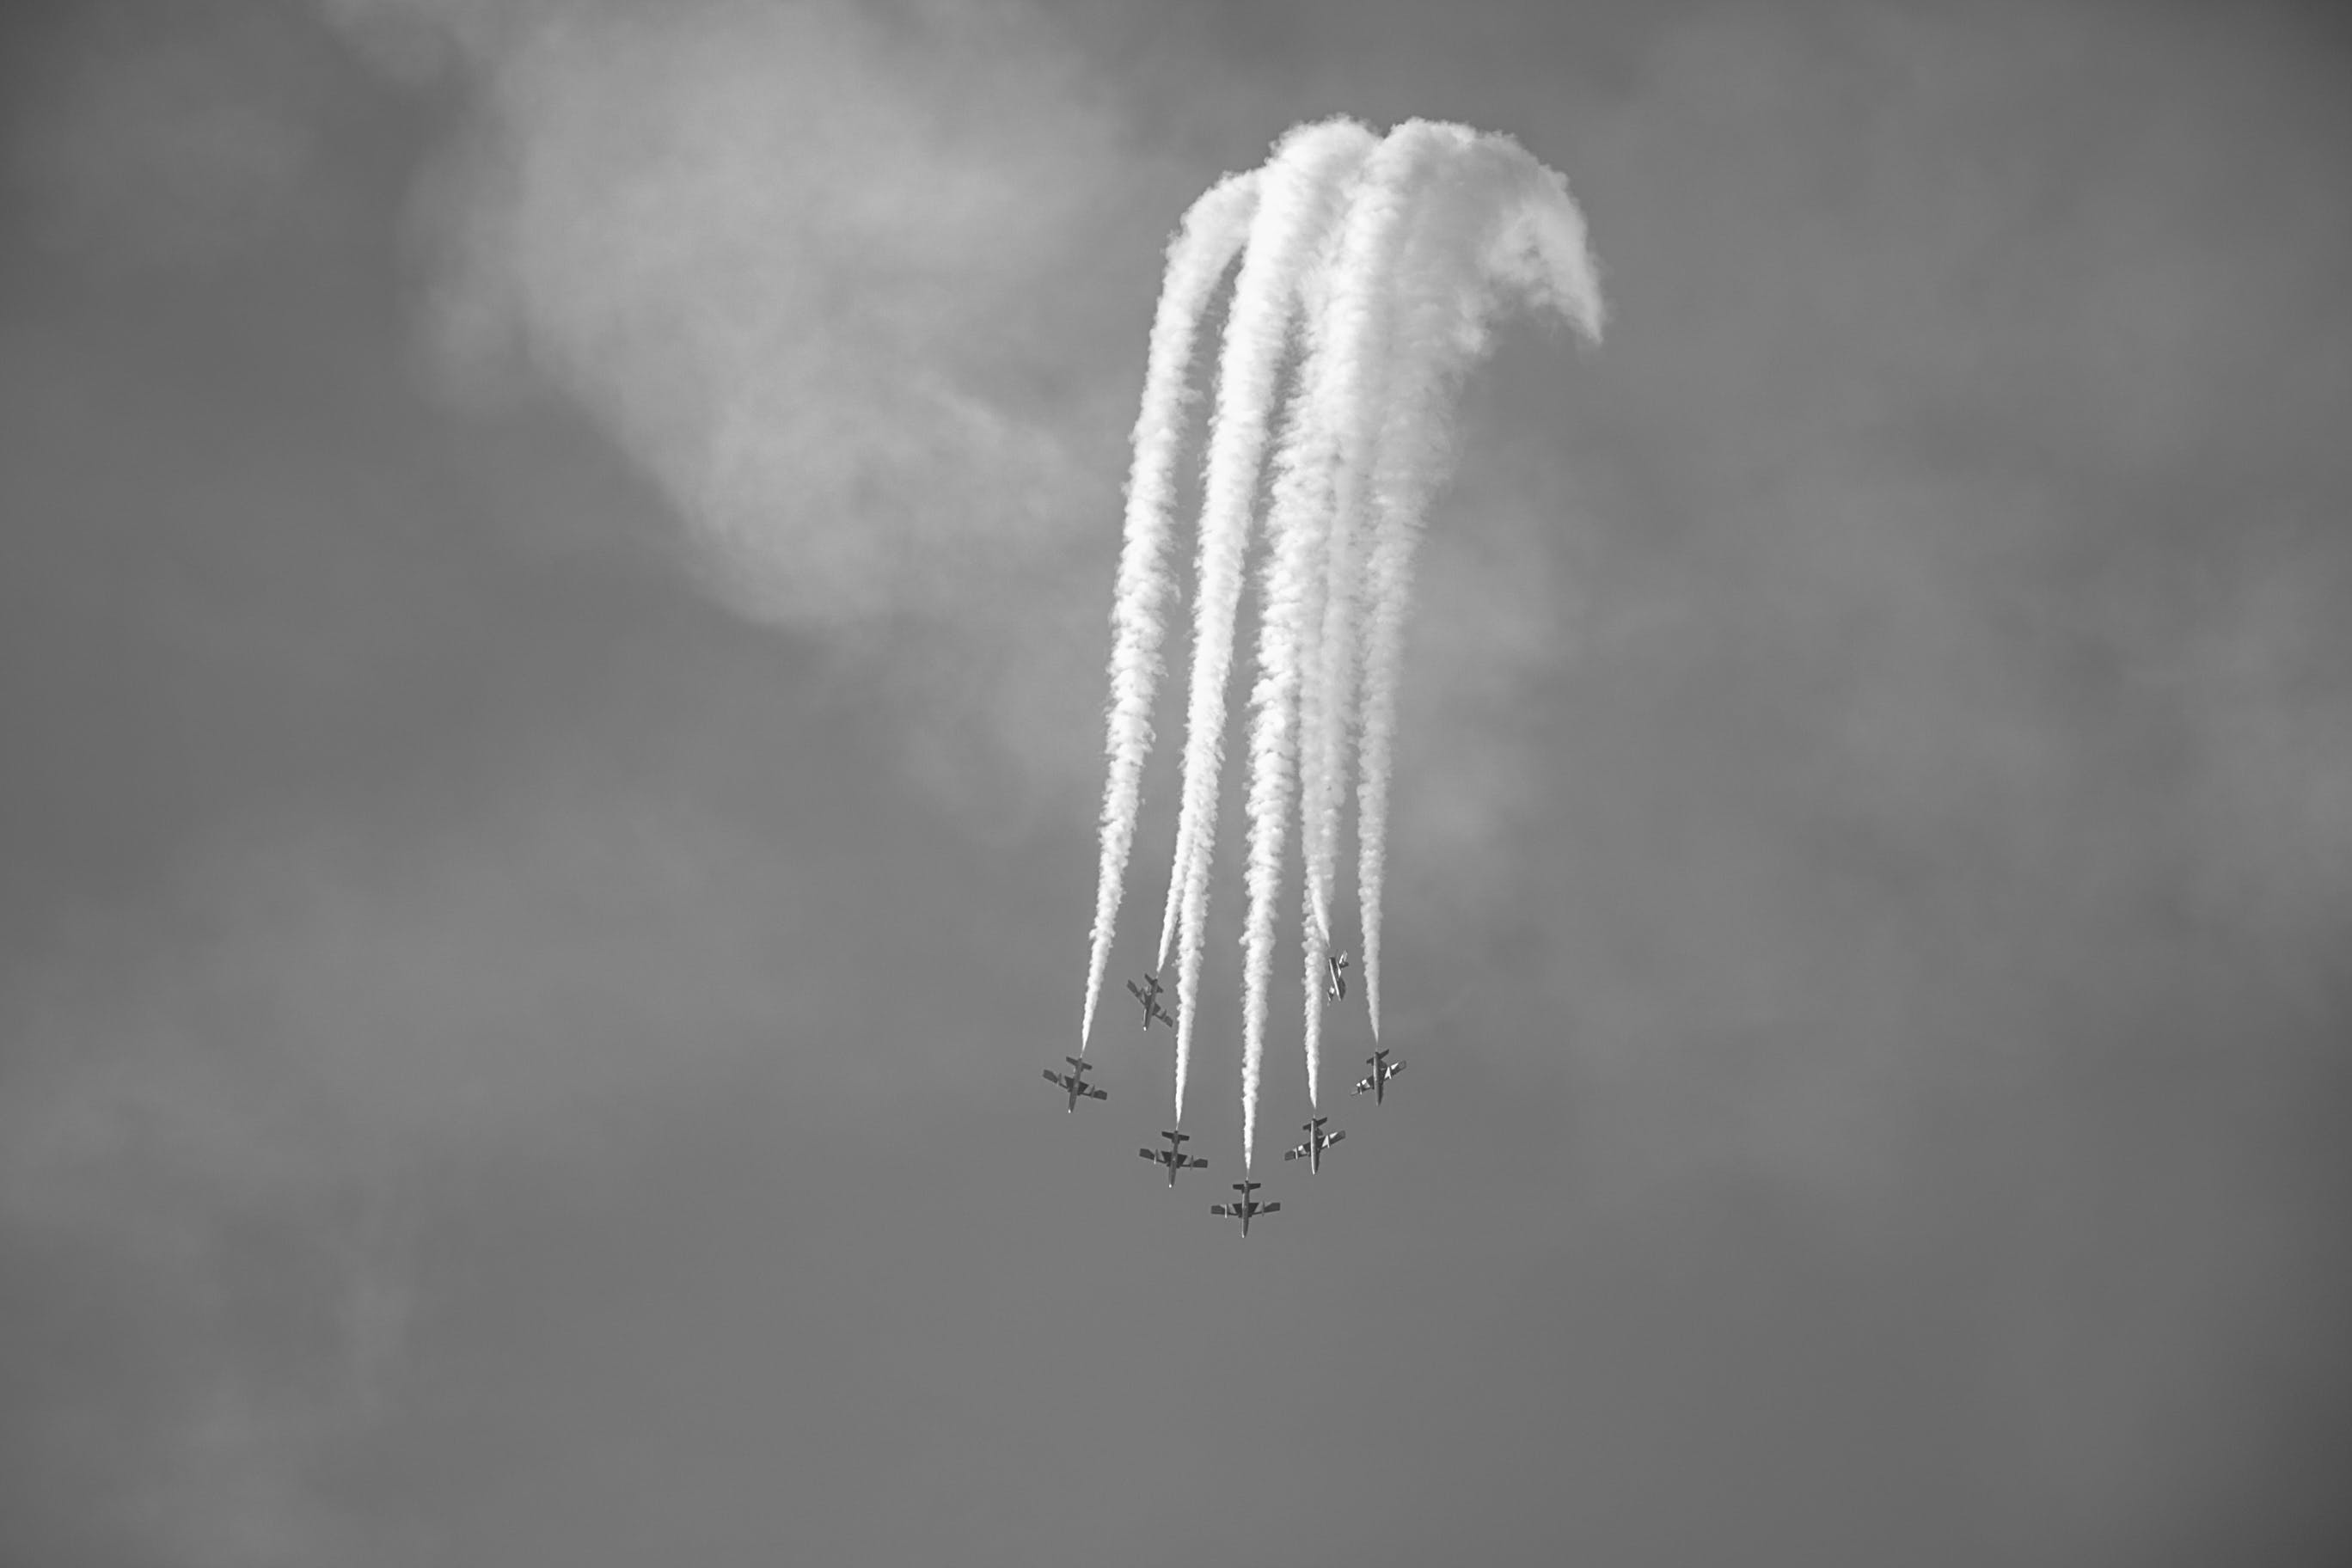 Gratis arkivbilde med flyging, himmel, kondensstriper, kunst